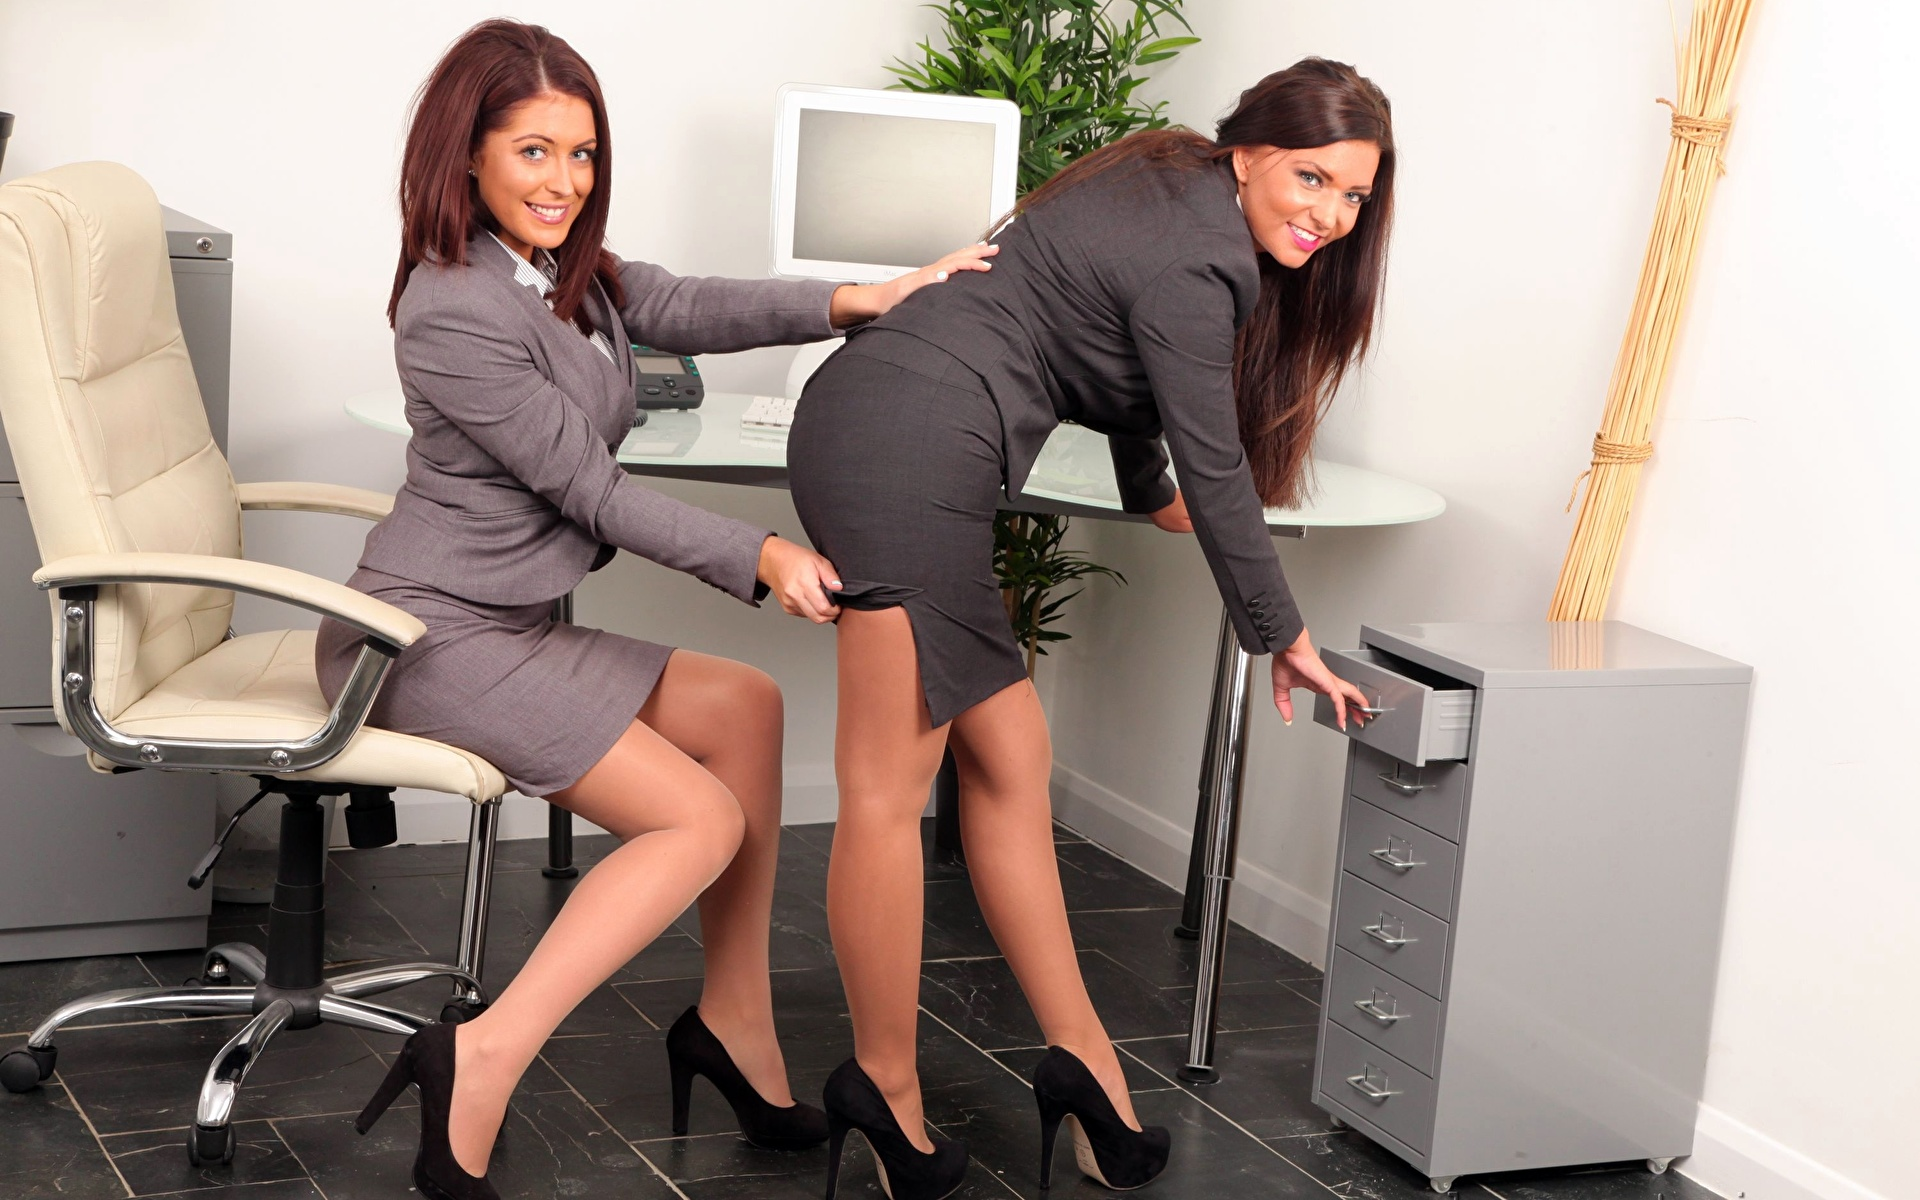 Фото на работе под столом, Девушка в чулках мастурбирует на работе под столом 18 фотография